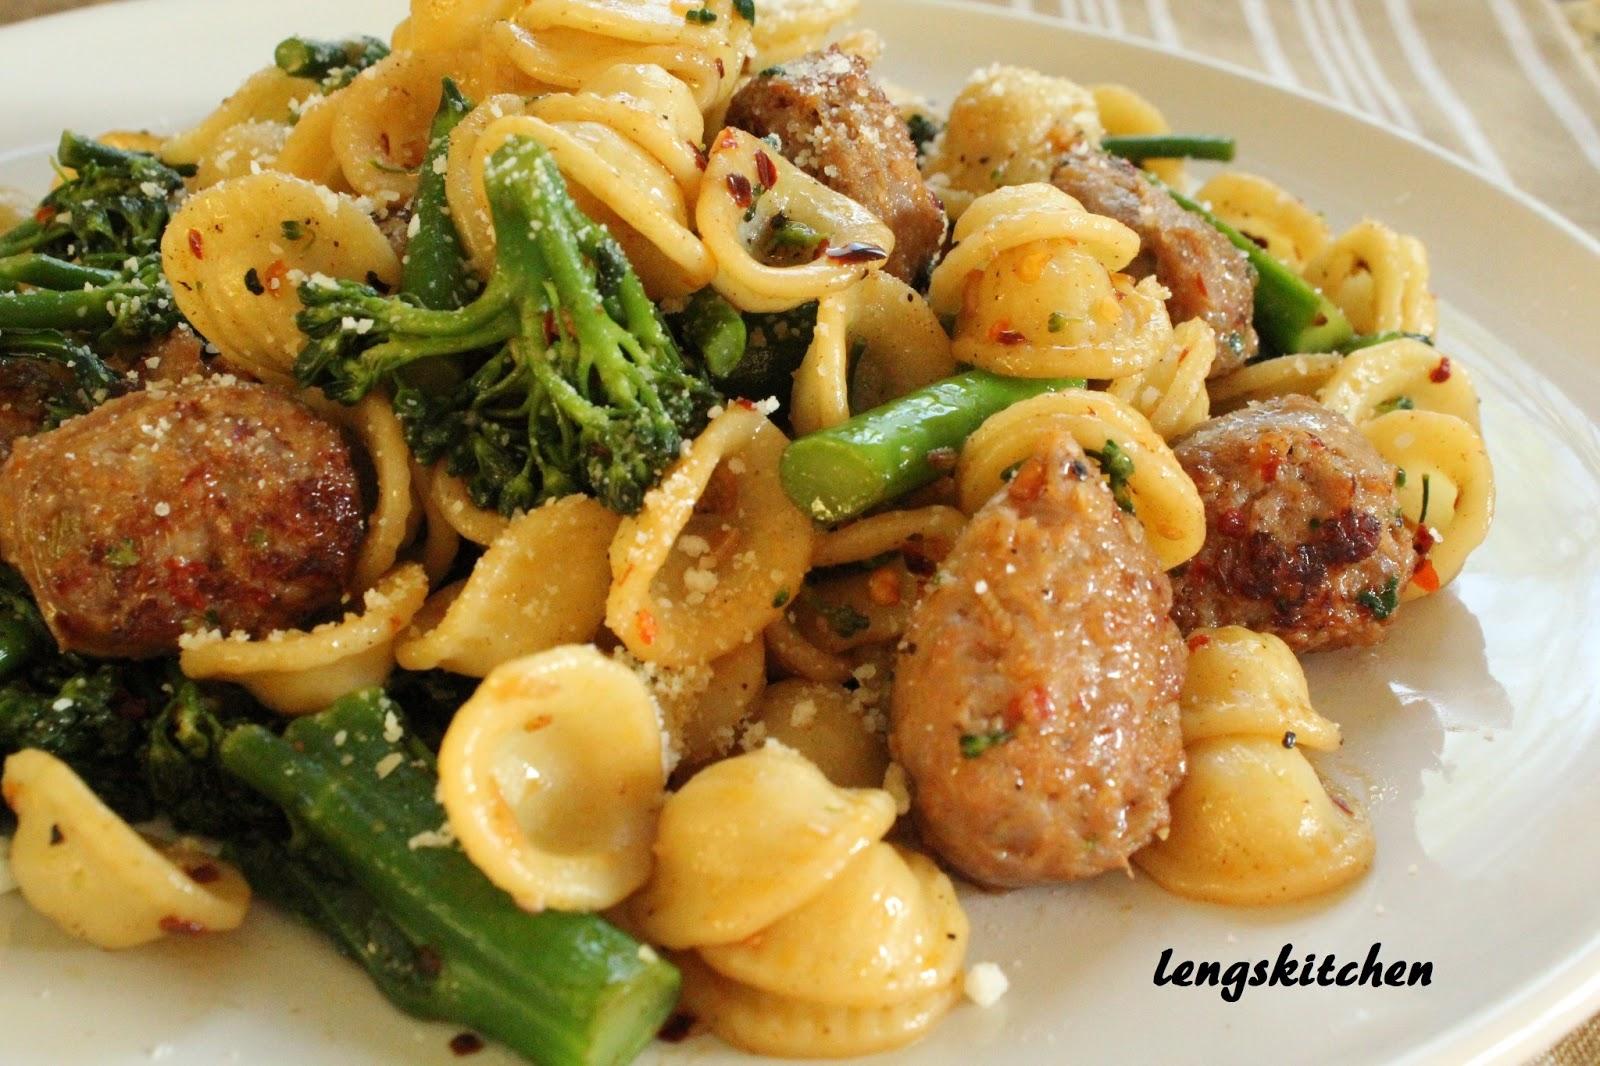 broccoli rabe skillet orecchiette with sausage and broccoli rabe ...